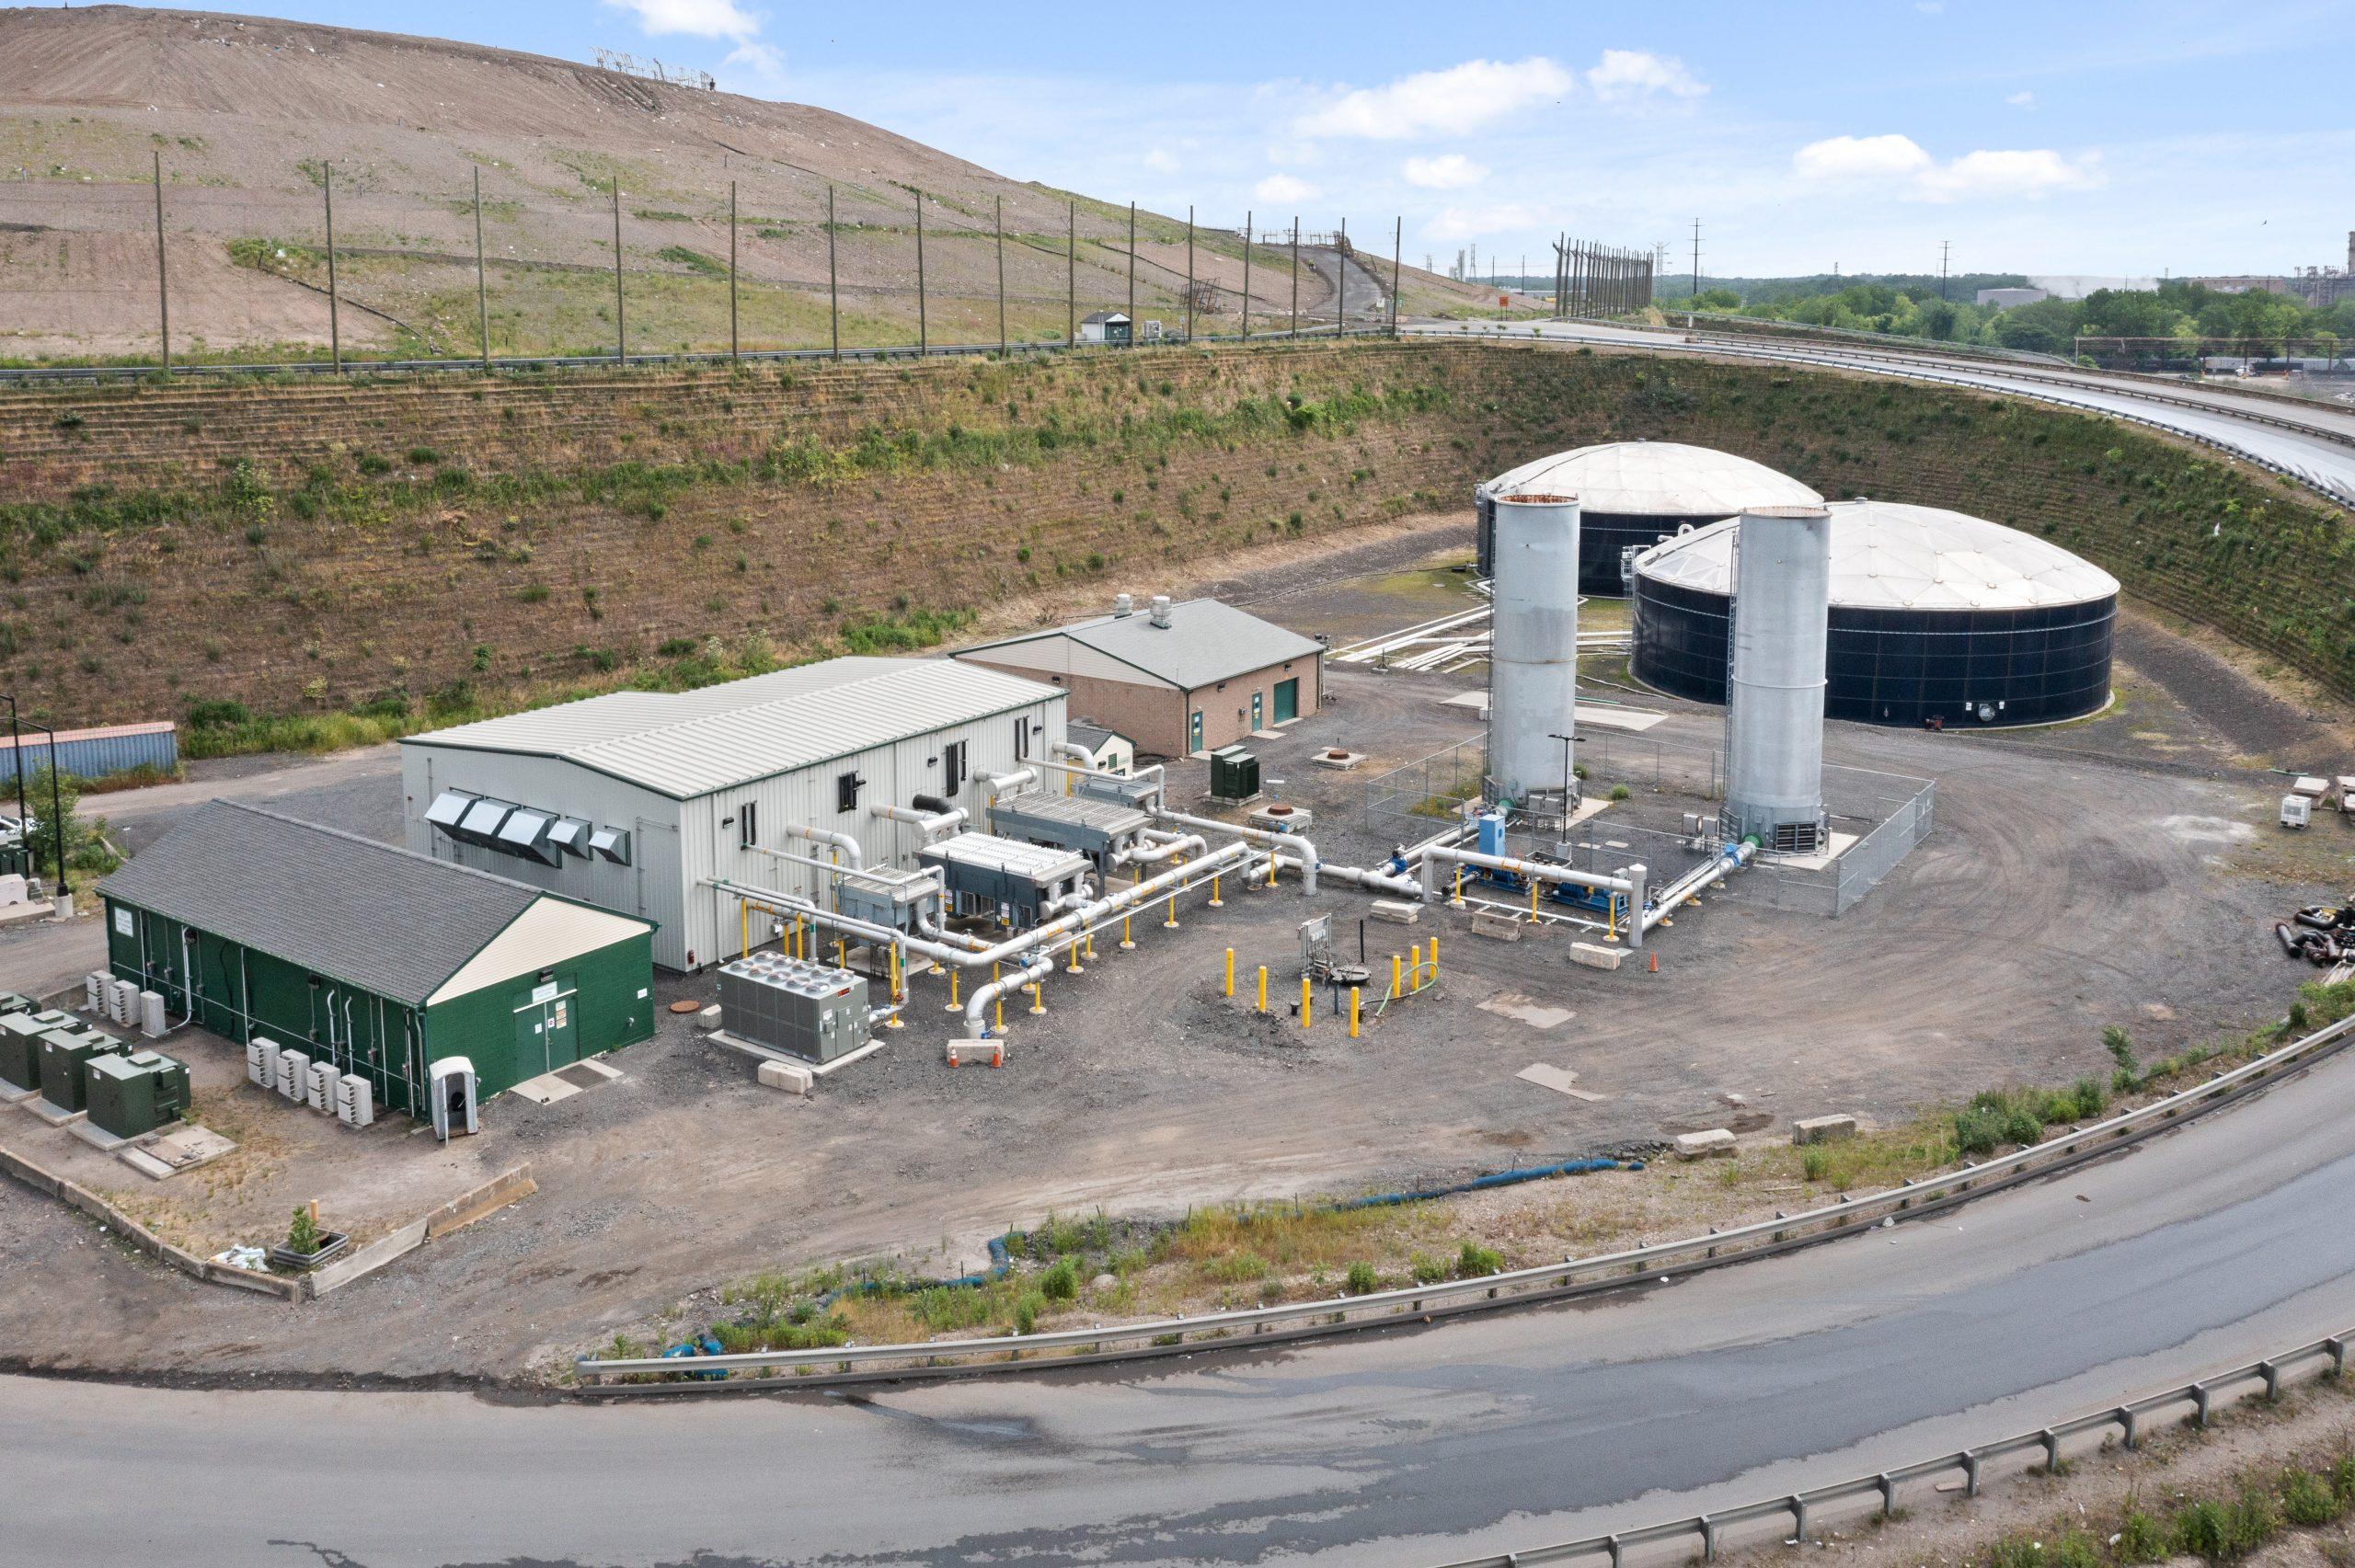 Waste Management Fairless Landfill LFG Blower/Dehydration Station Expansion